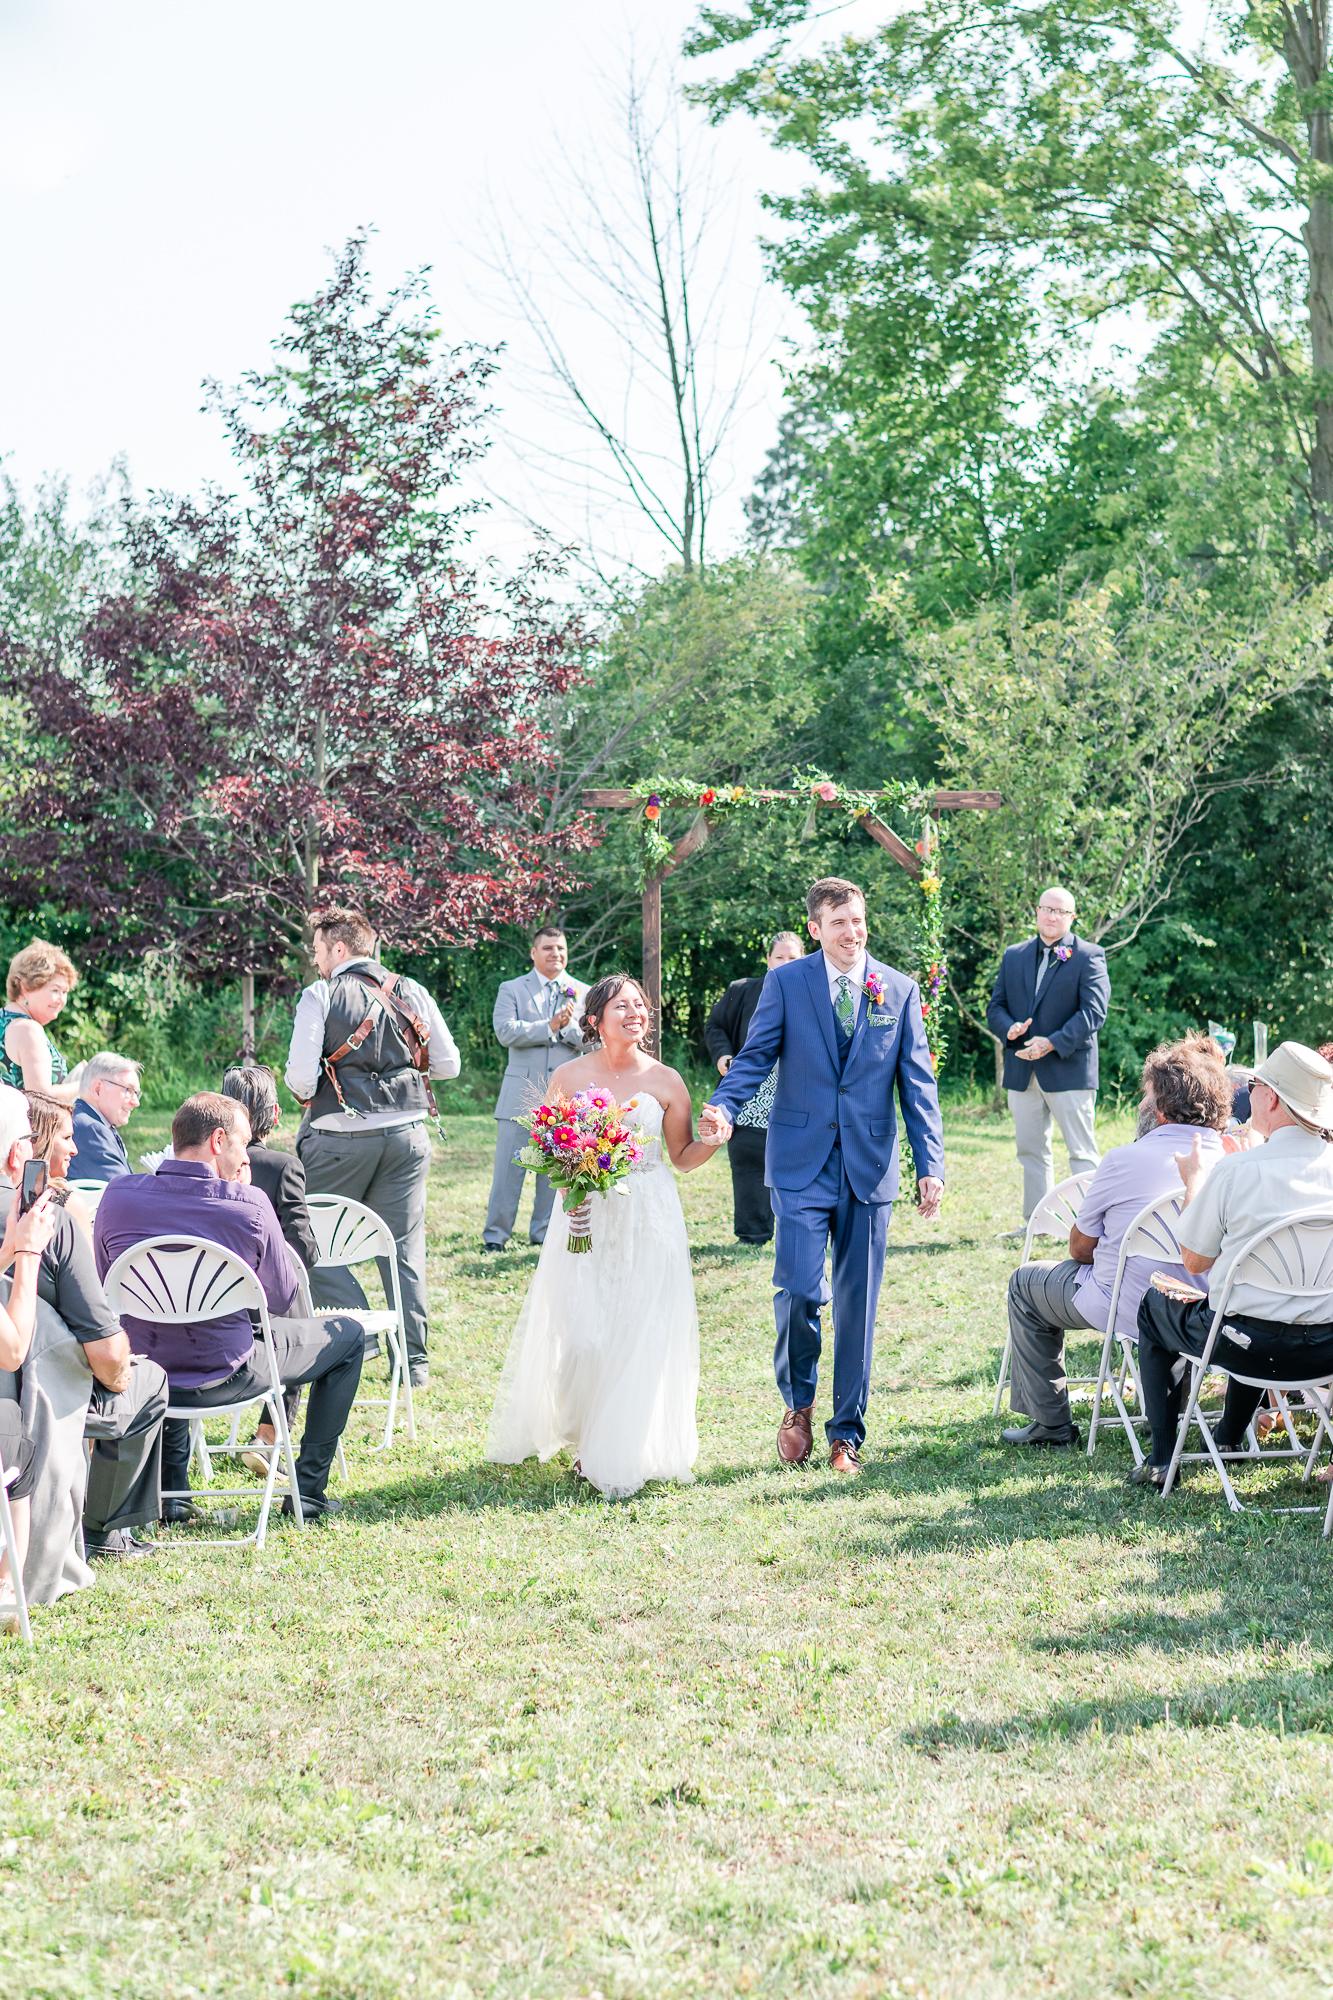 Maria+Adam_Summer Barn Wedding_The Barn at The North Star Preserve_Oberlin_Ohio-178.jpg